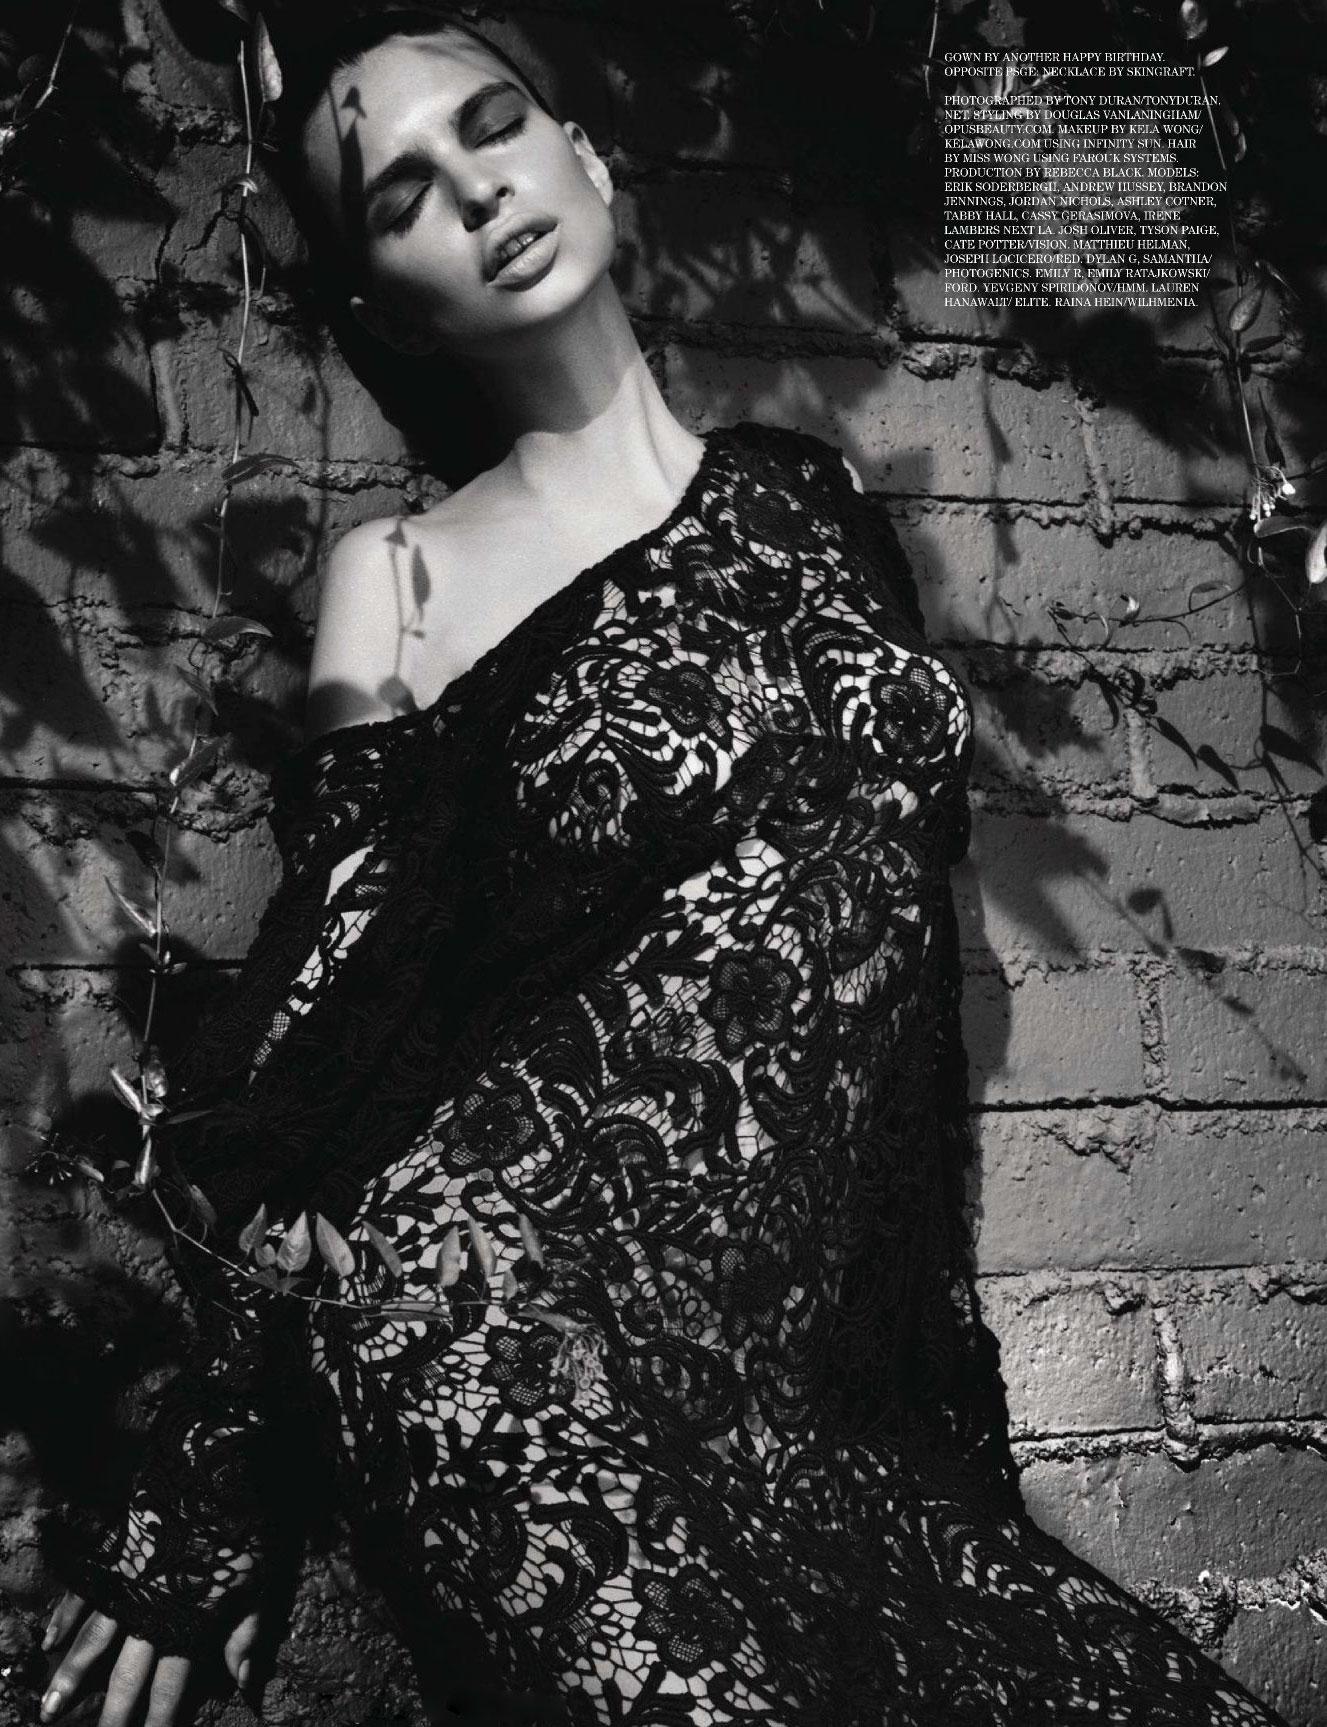 Emily Ratajkowski and other / The Casting by Tony Duran / Treats! Magazine issue 01 spring 2011